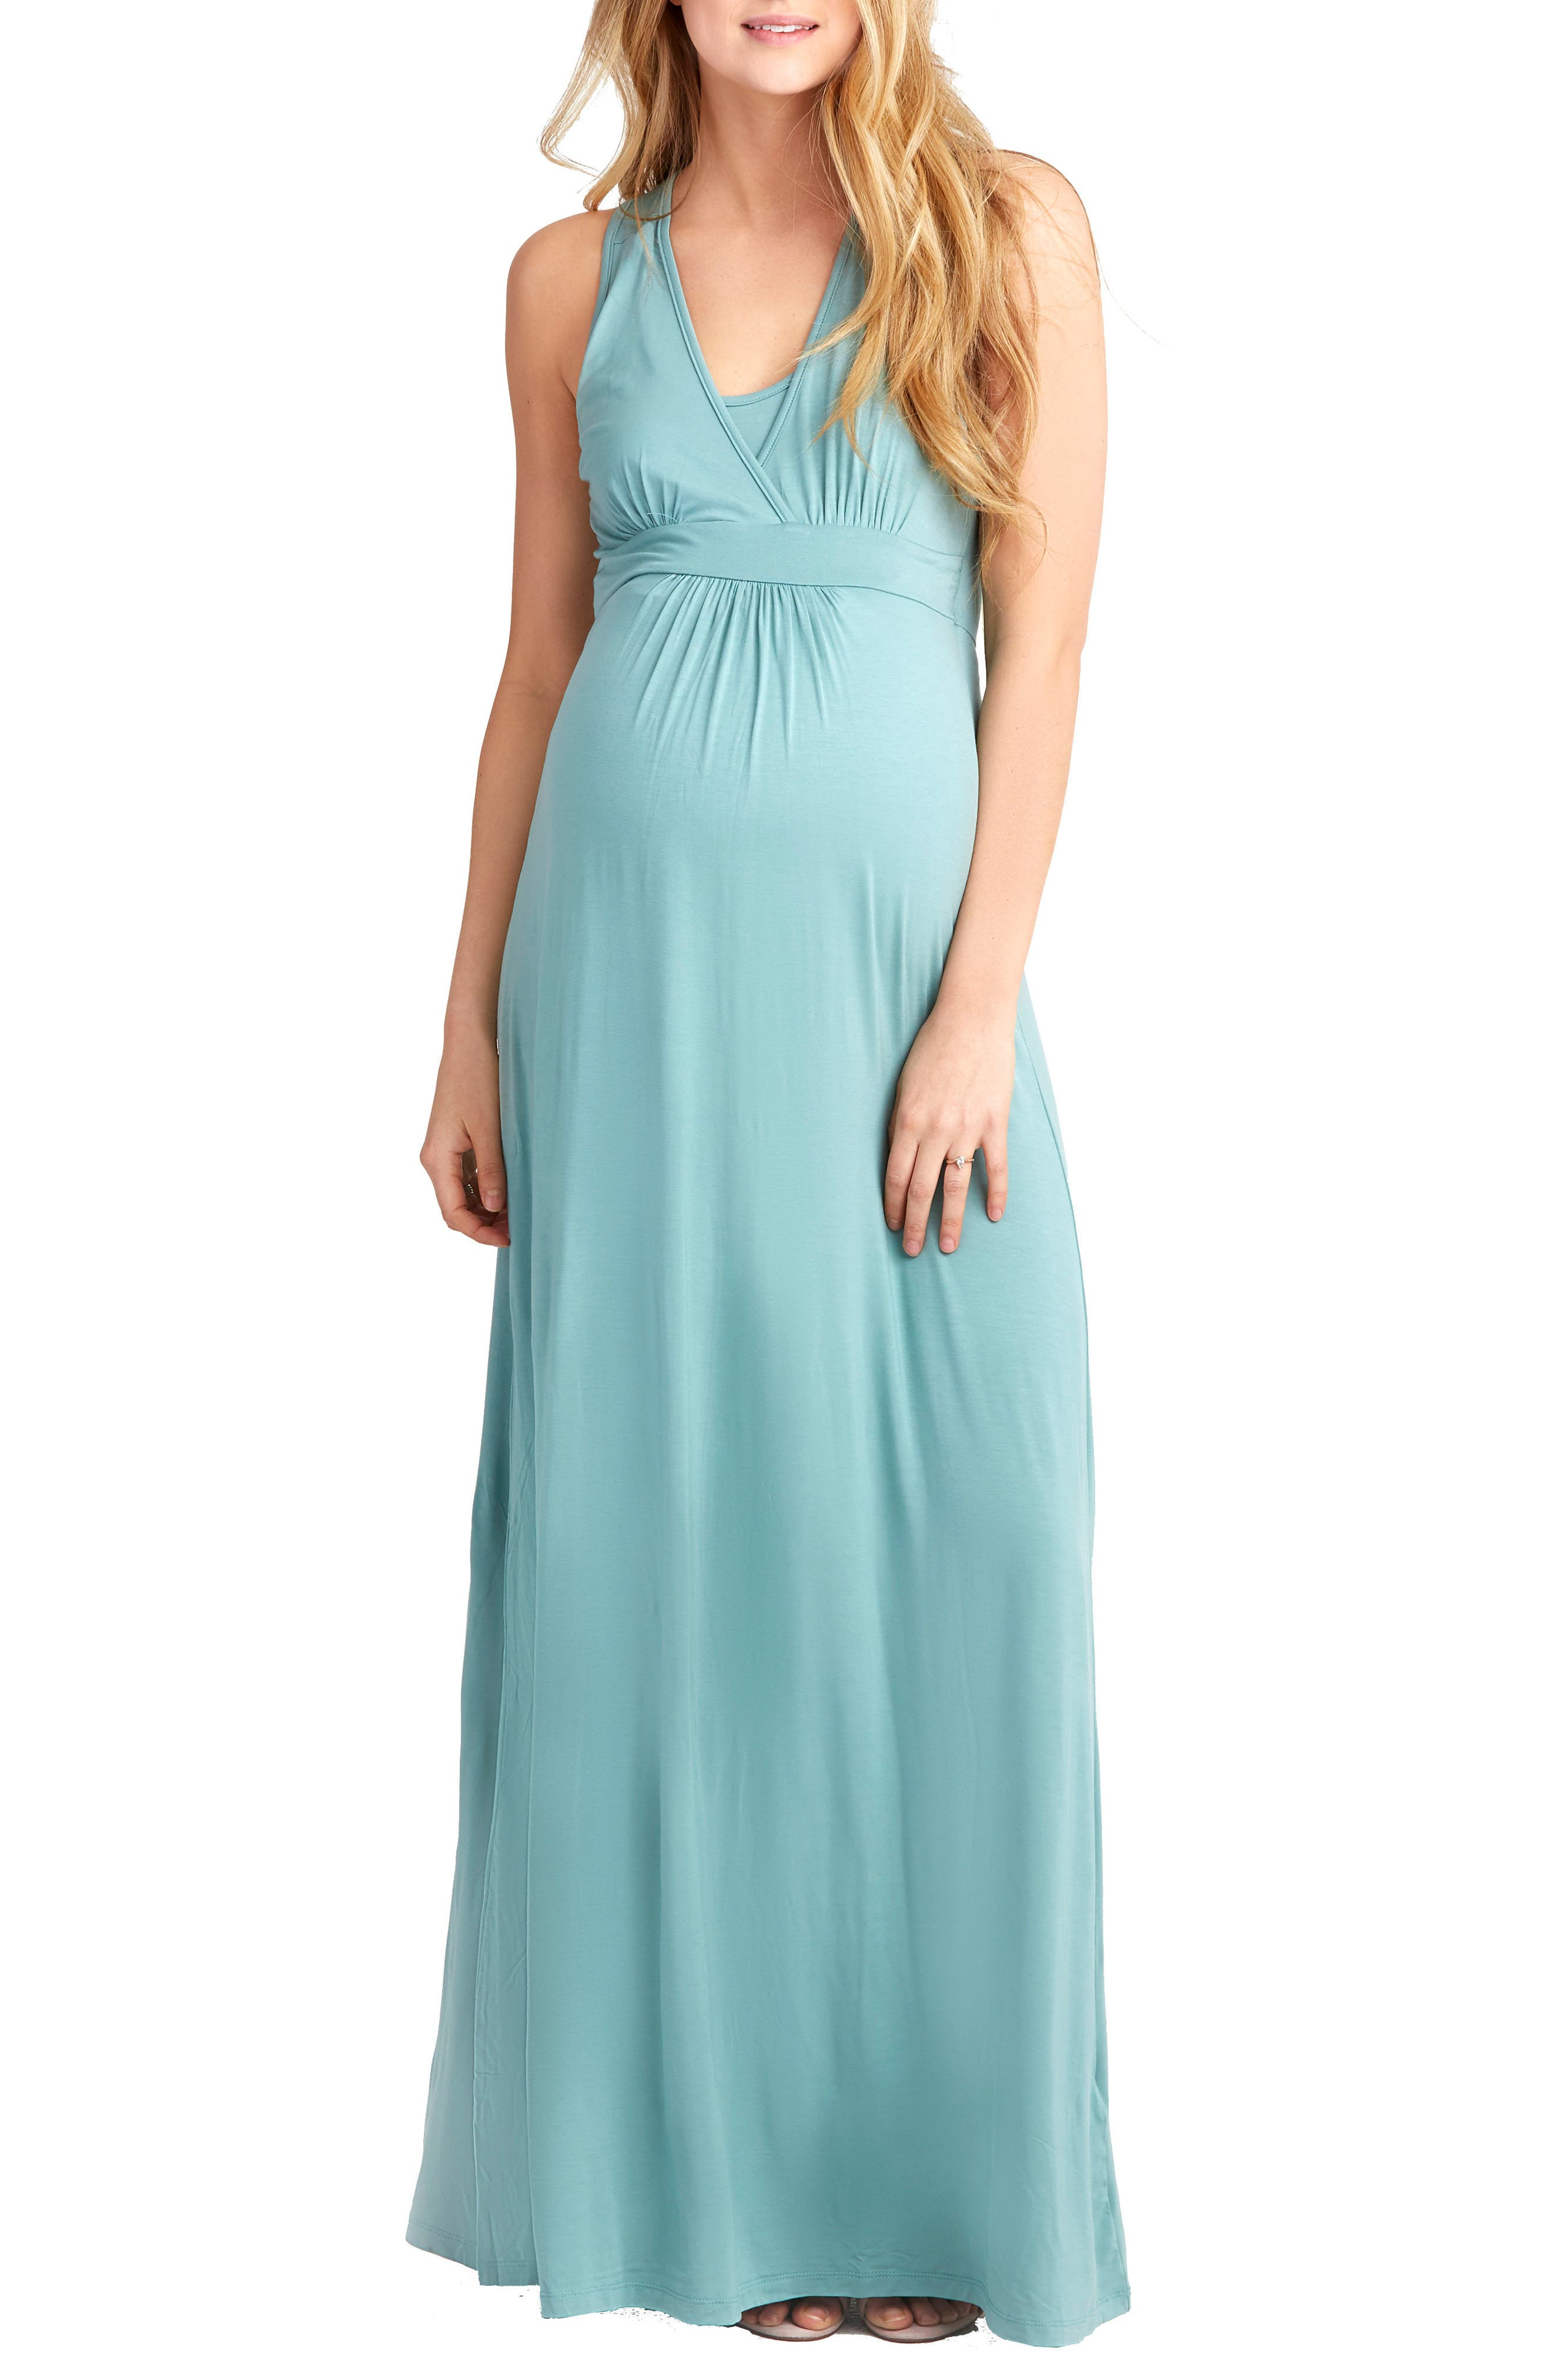 Pregnancy Dresses For Weddings. Wedding Guest Dresses For Maternity ...